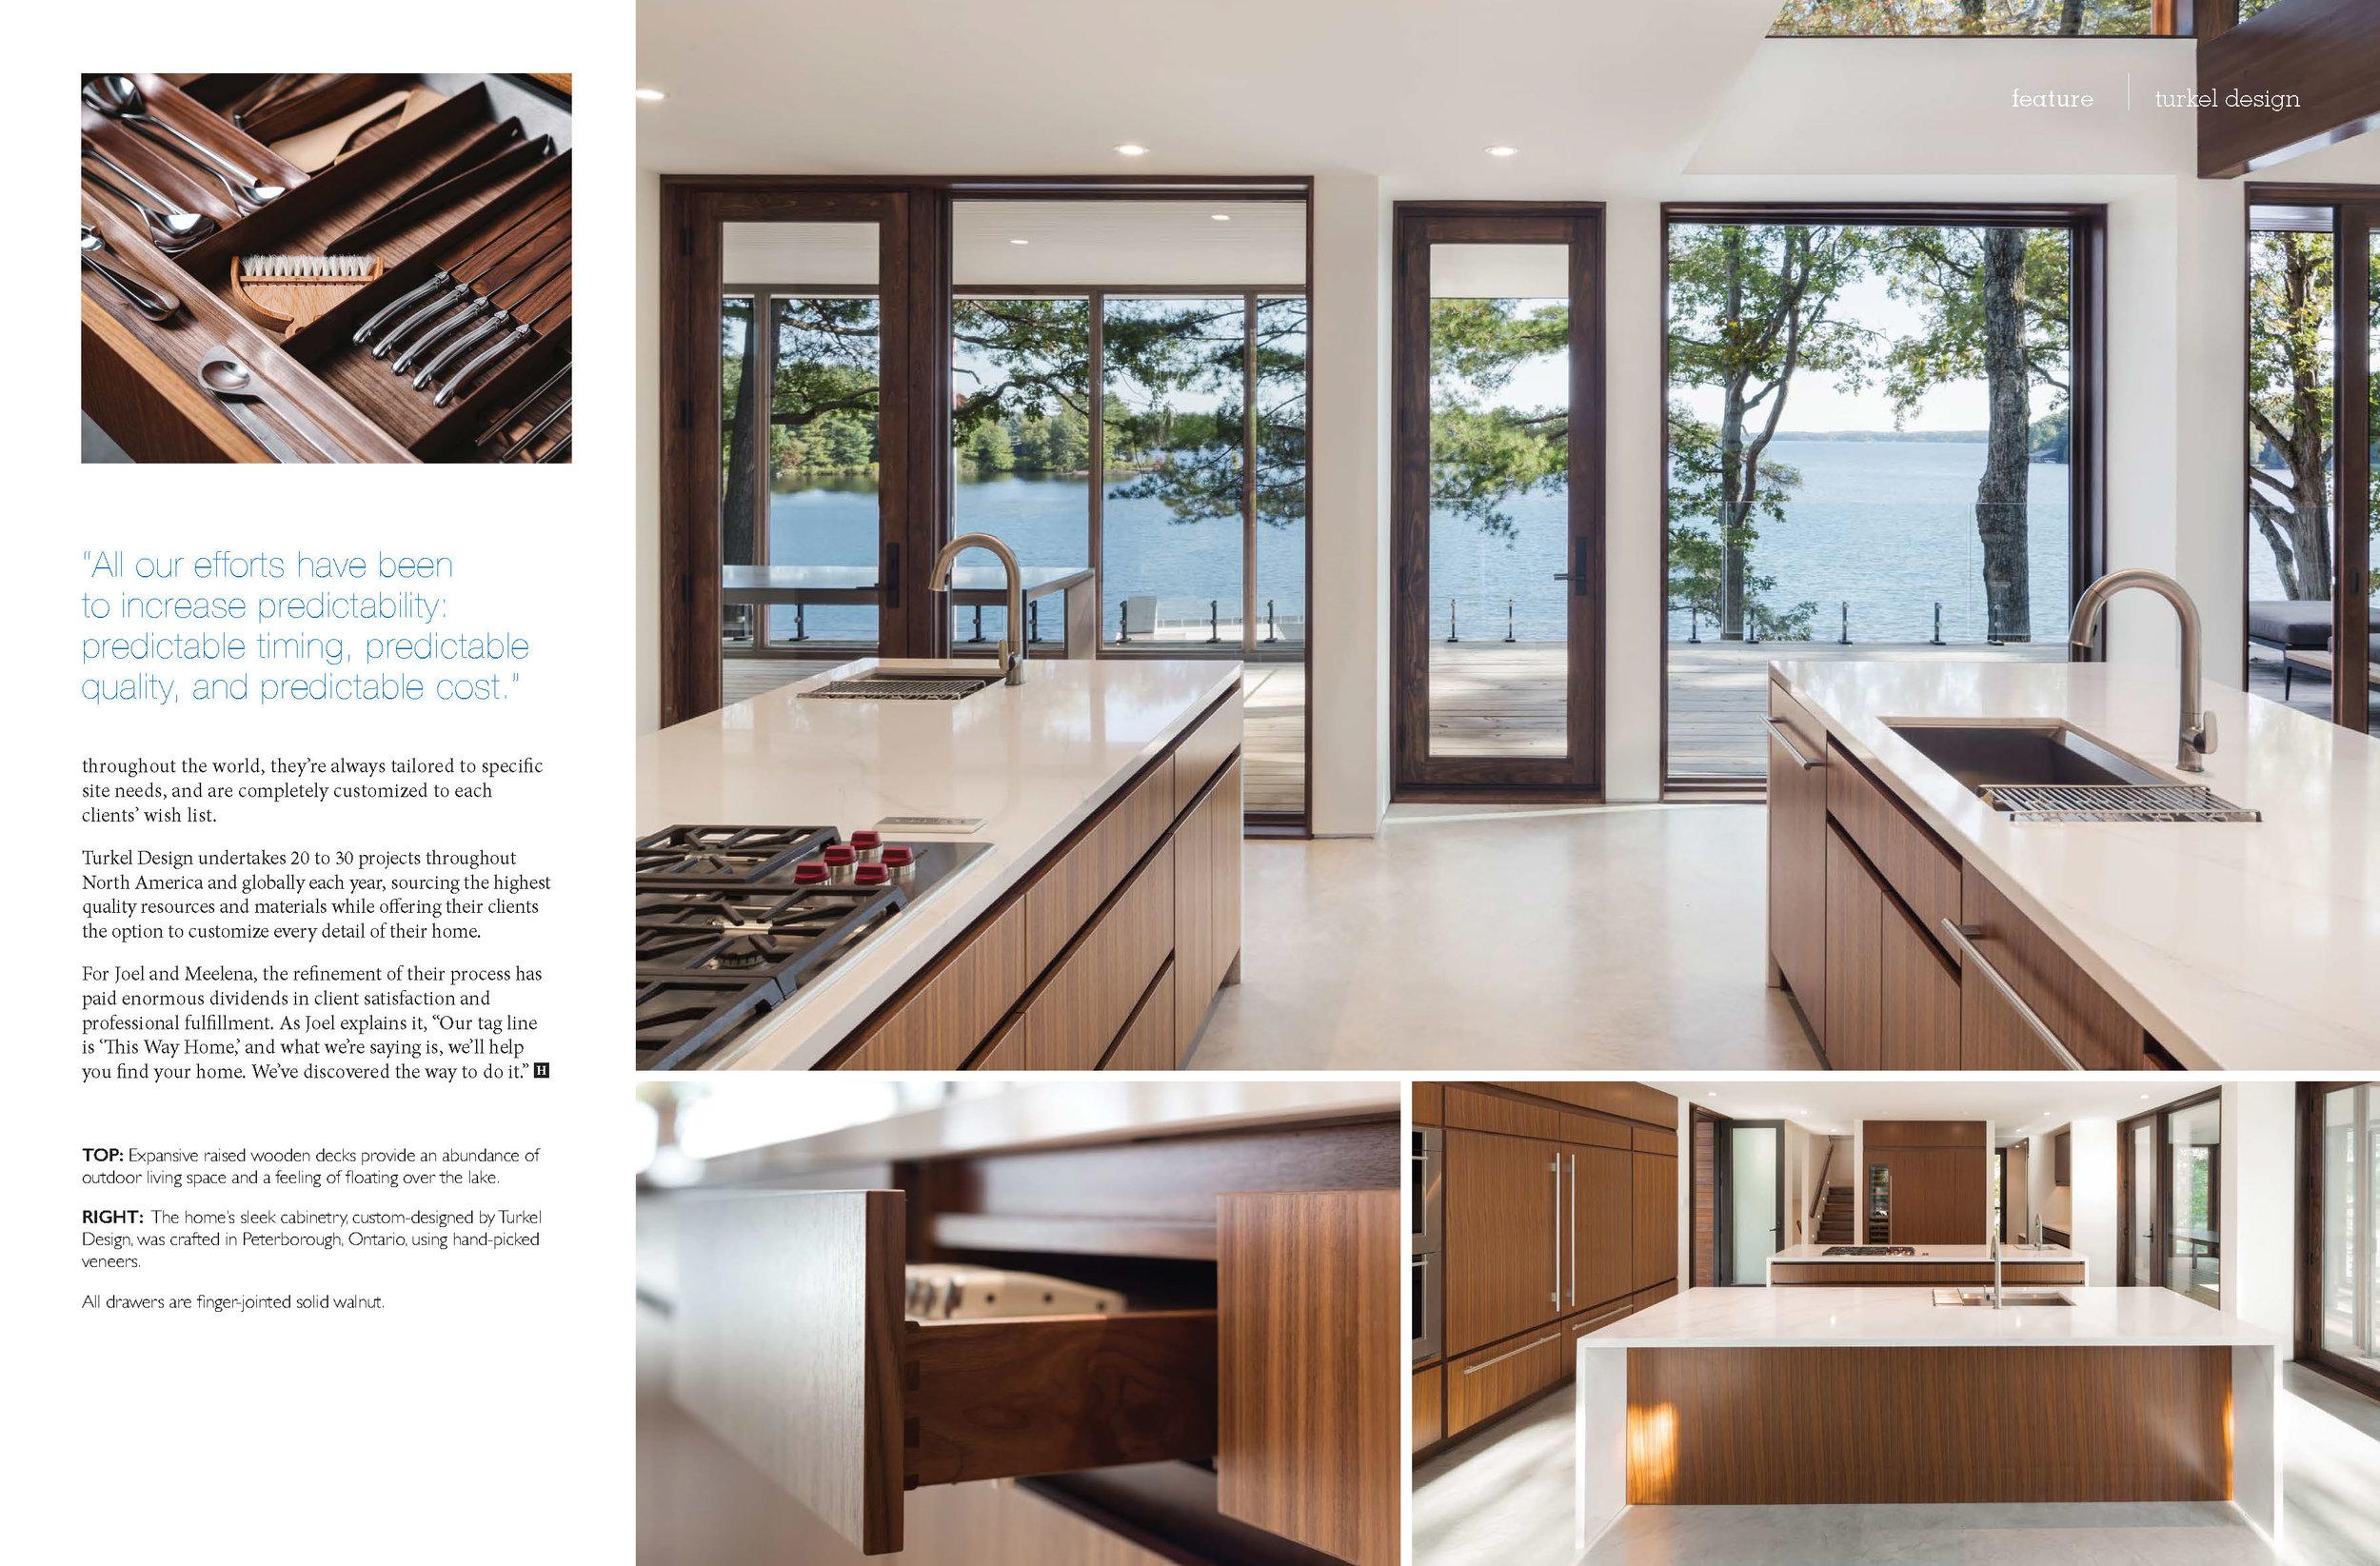 turkel_design_modern_prefab_home_muskoka_hideaways_Page_4.jpg